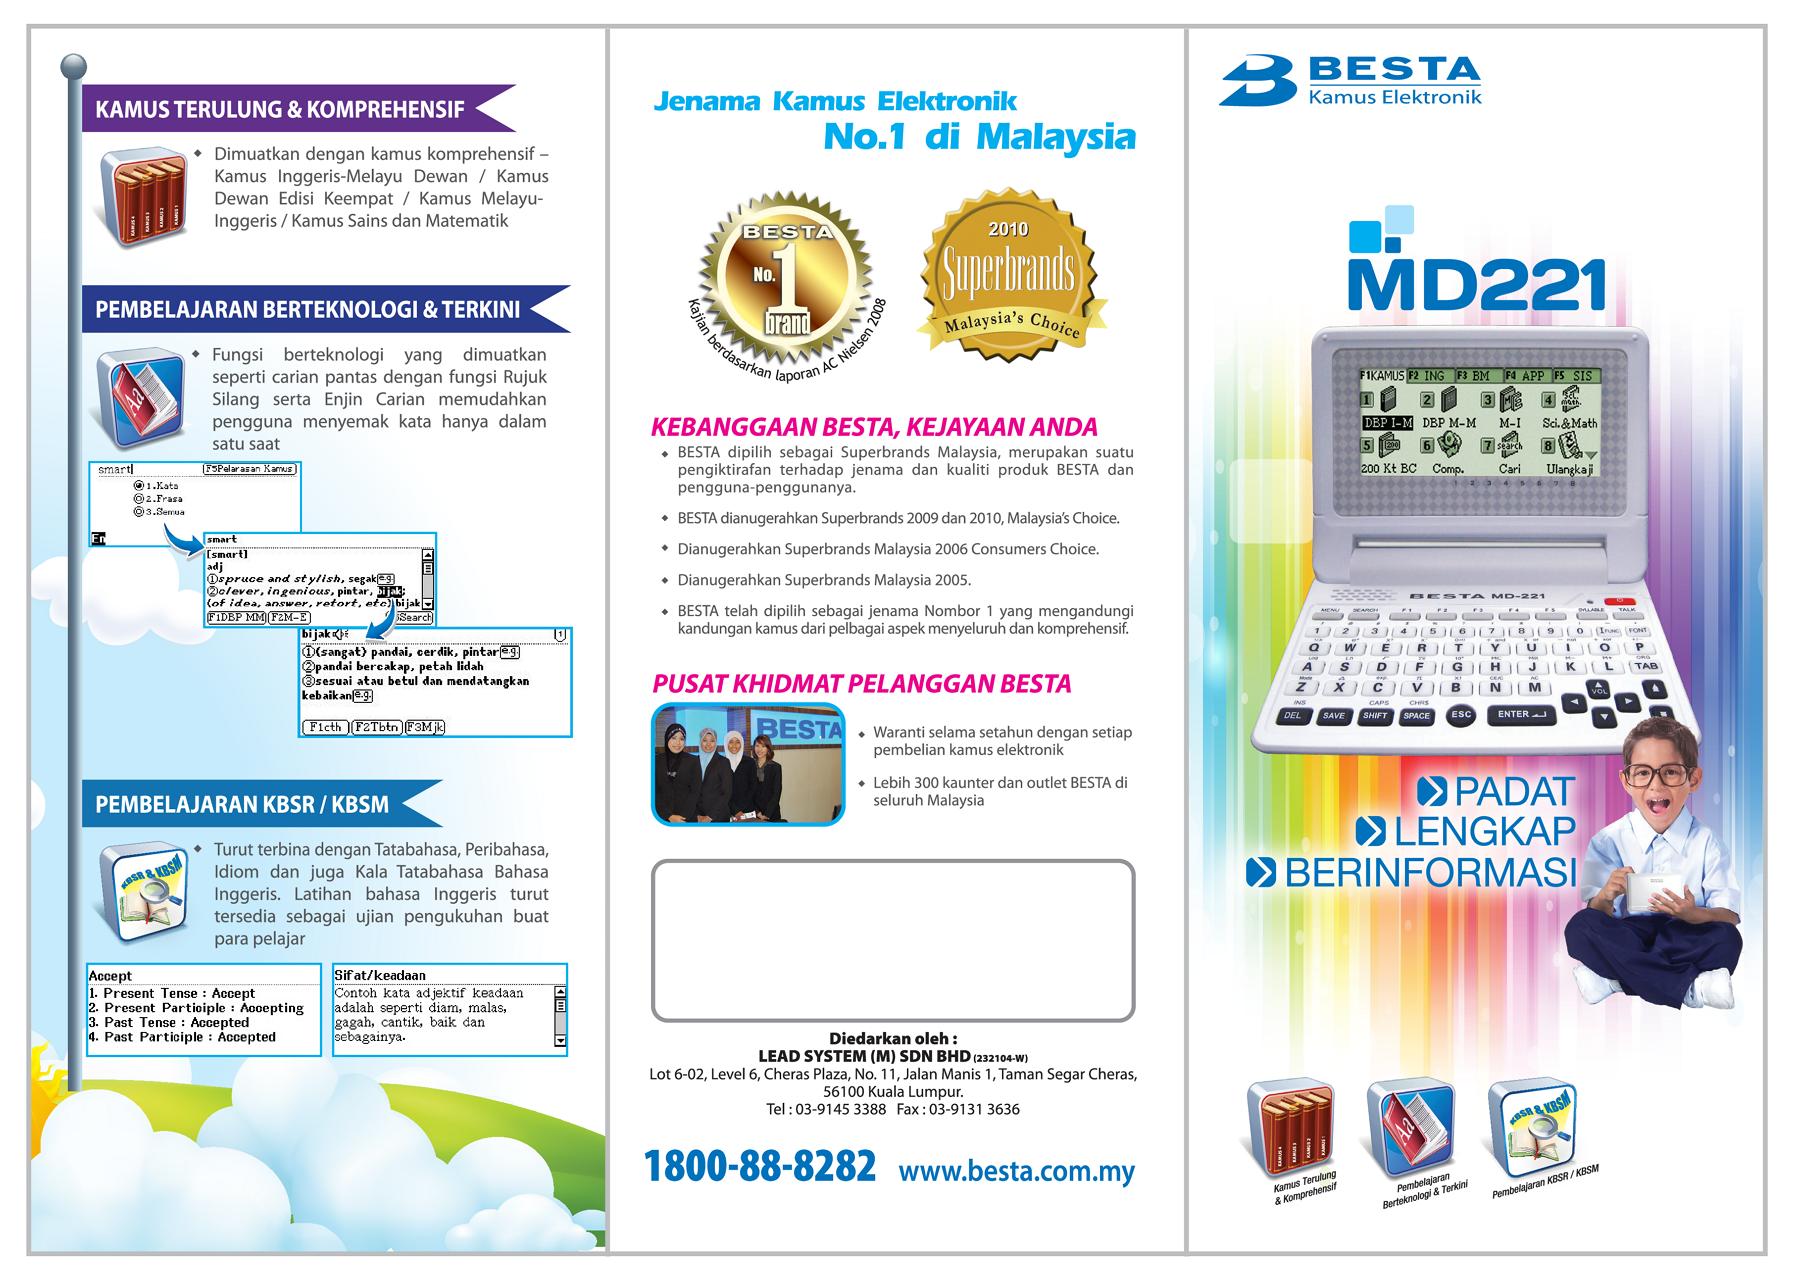 MD221 Brochure 1